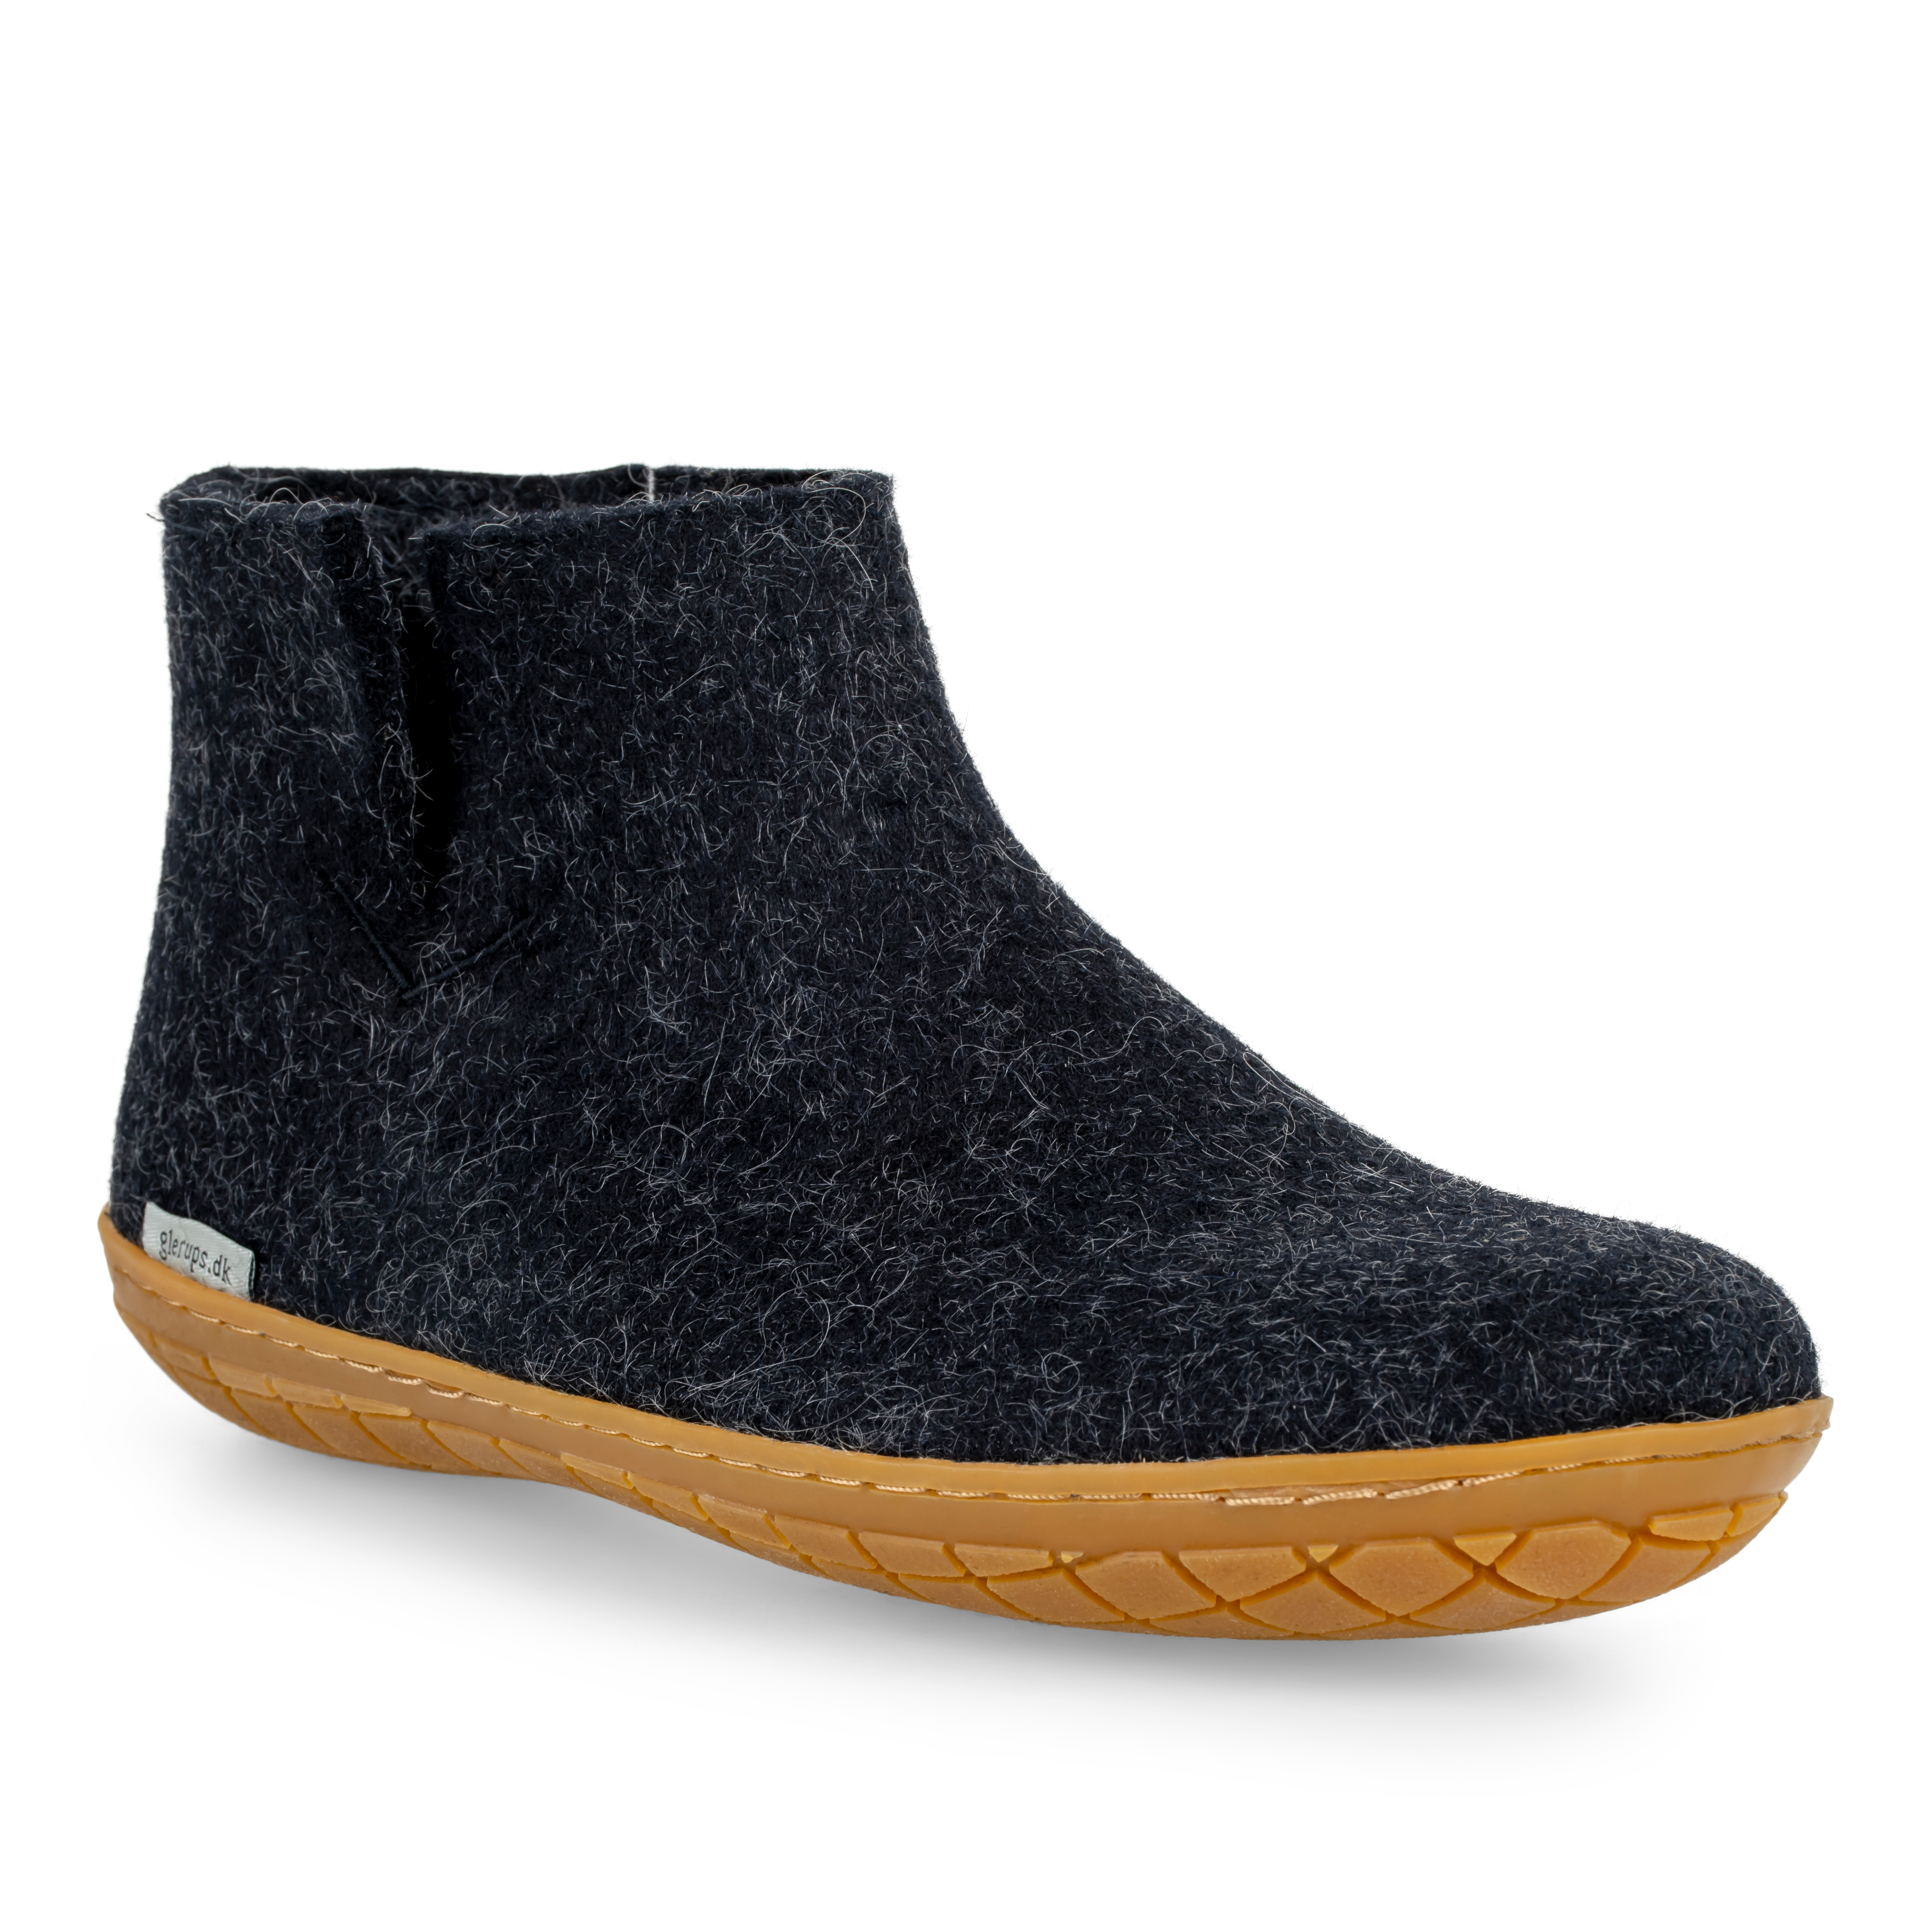 Glerups støvle med naturgummibund, koksgrå, 39